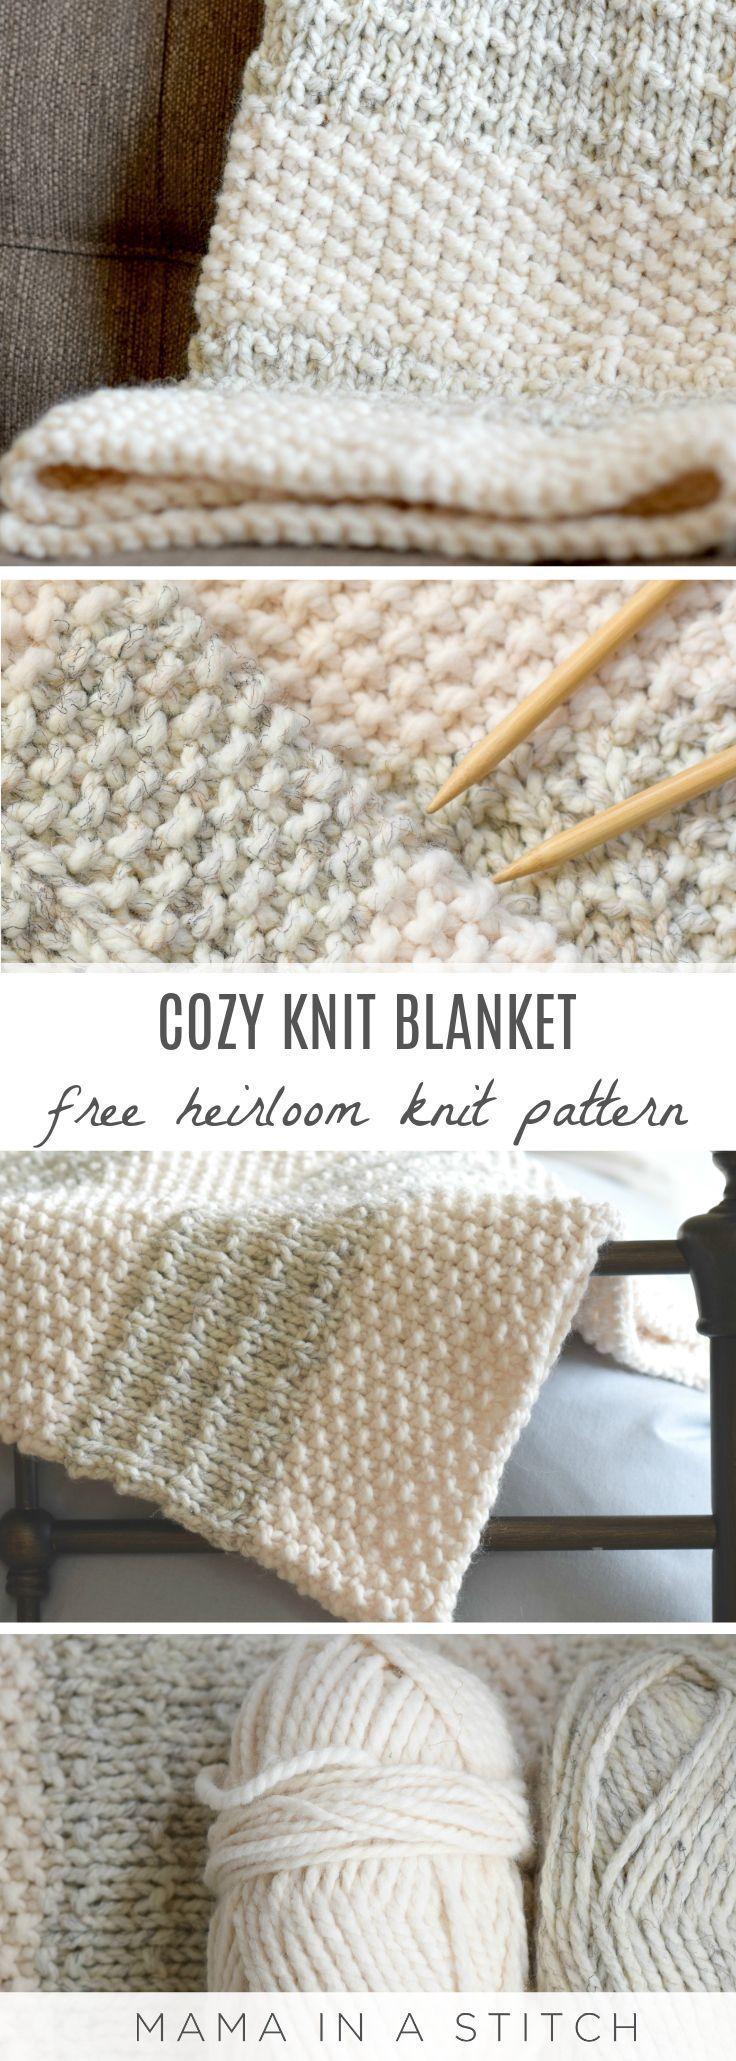 3829 best Pretty Knitting Patterns images on Pinterest | Knitting ...